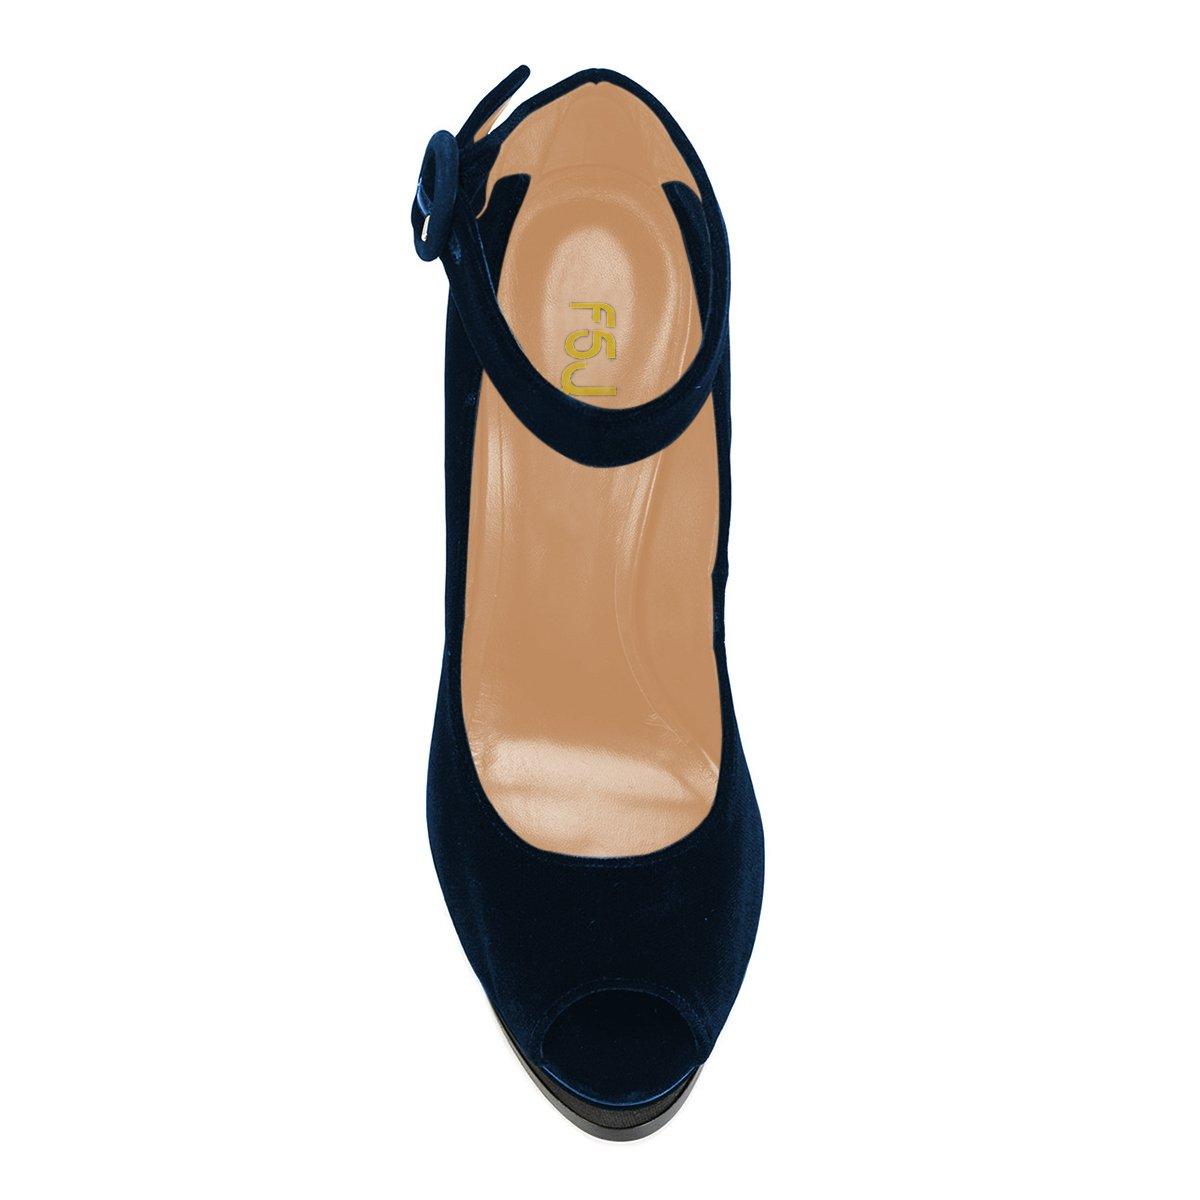 FSJ Women Ankle Strap Platform Pumps Peep Toe Chunky High Heels Faux Suede Party Sandals Size 4-15 US B0776TDCTV 9 M US|Navy